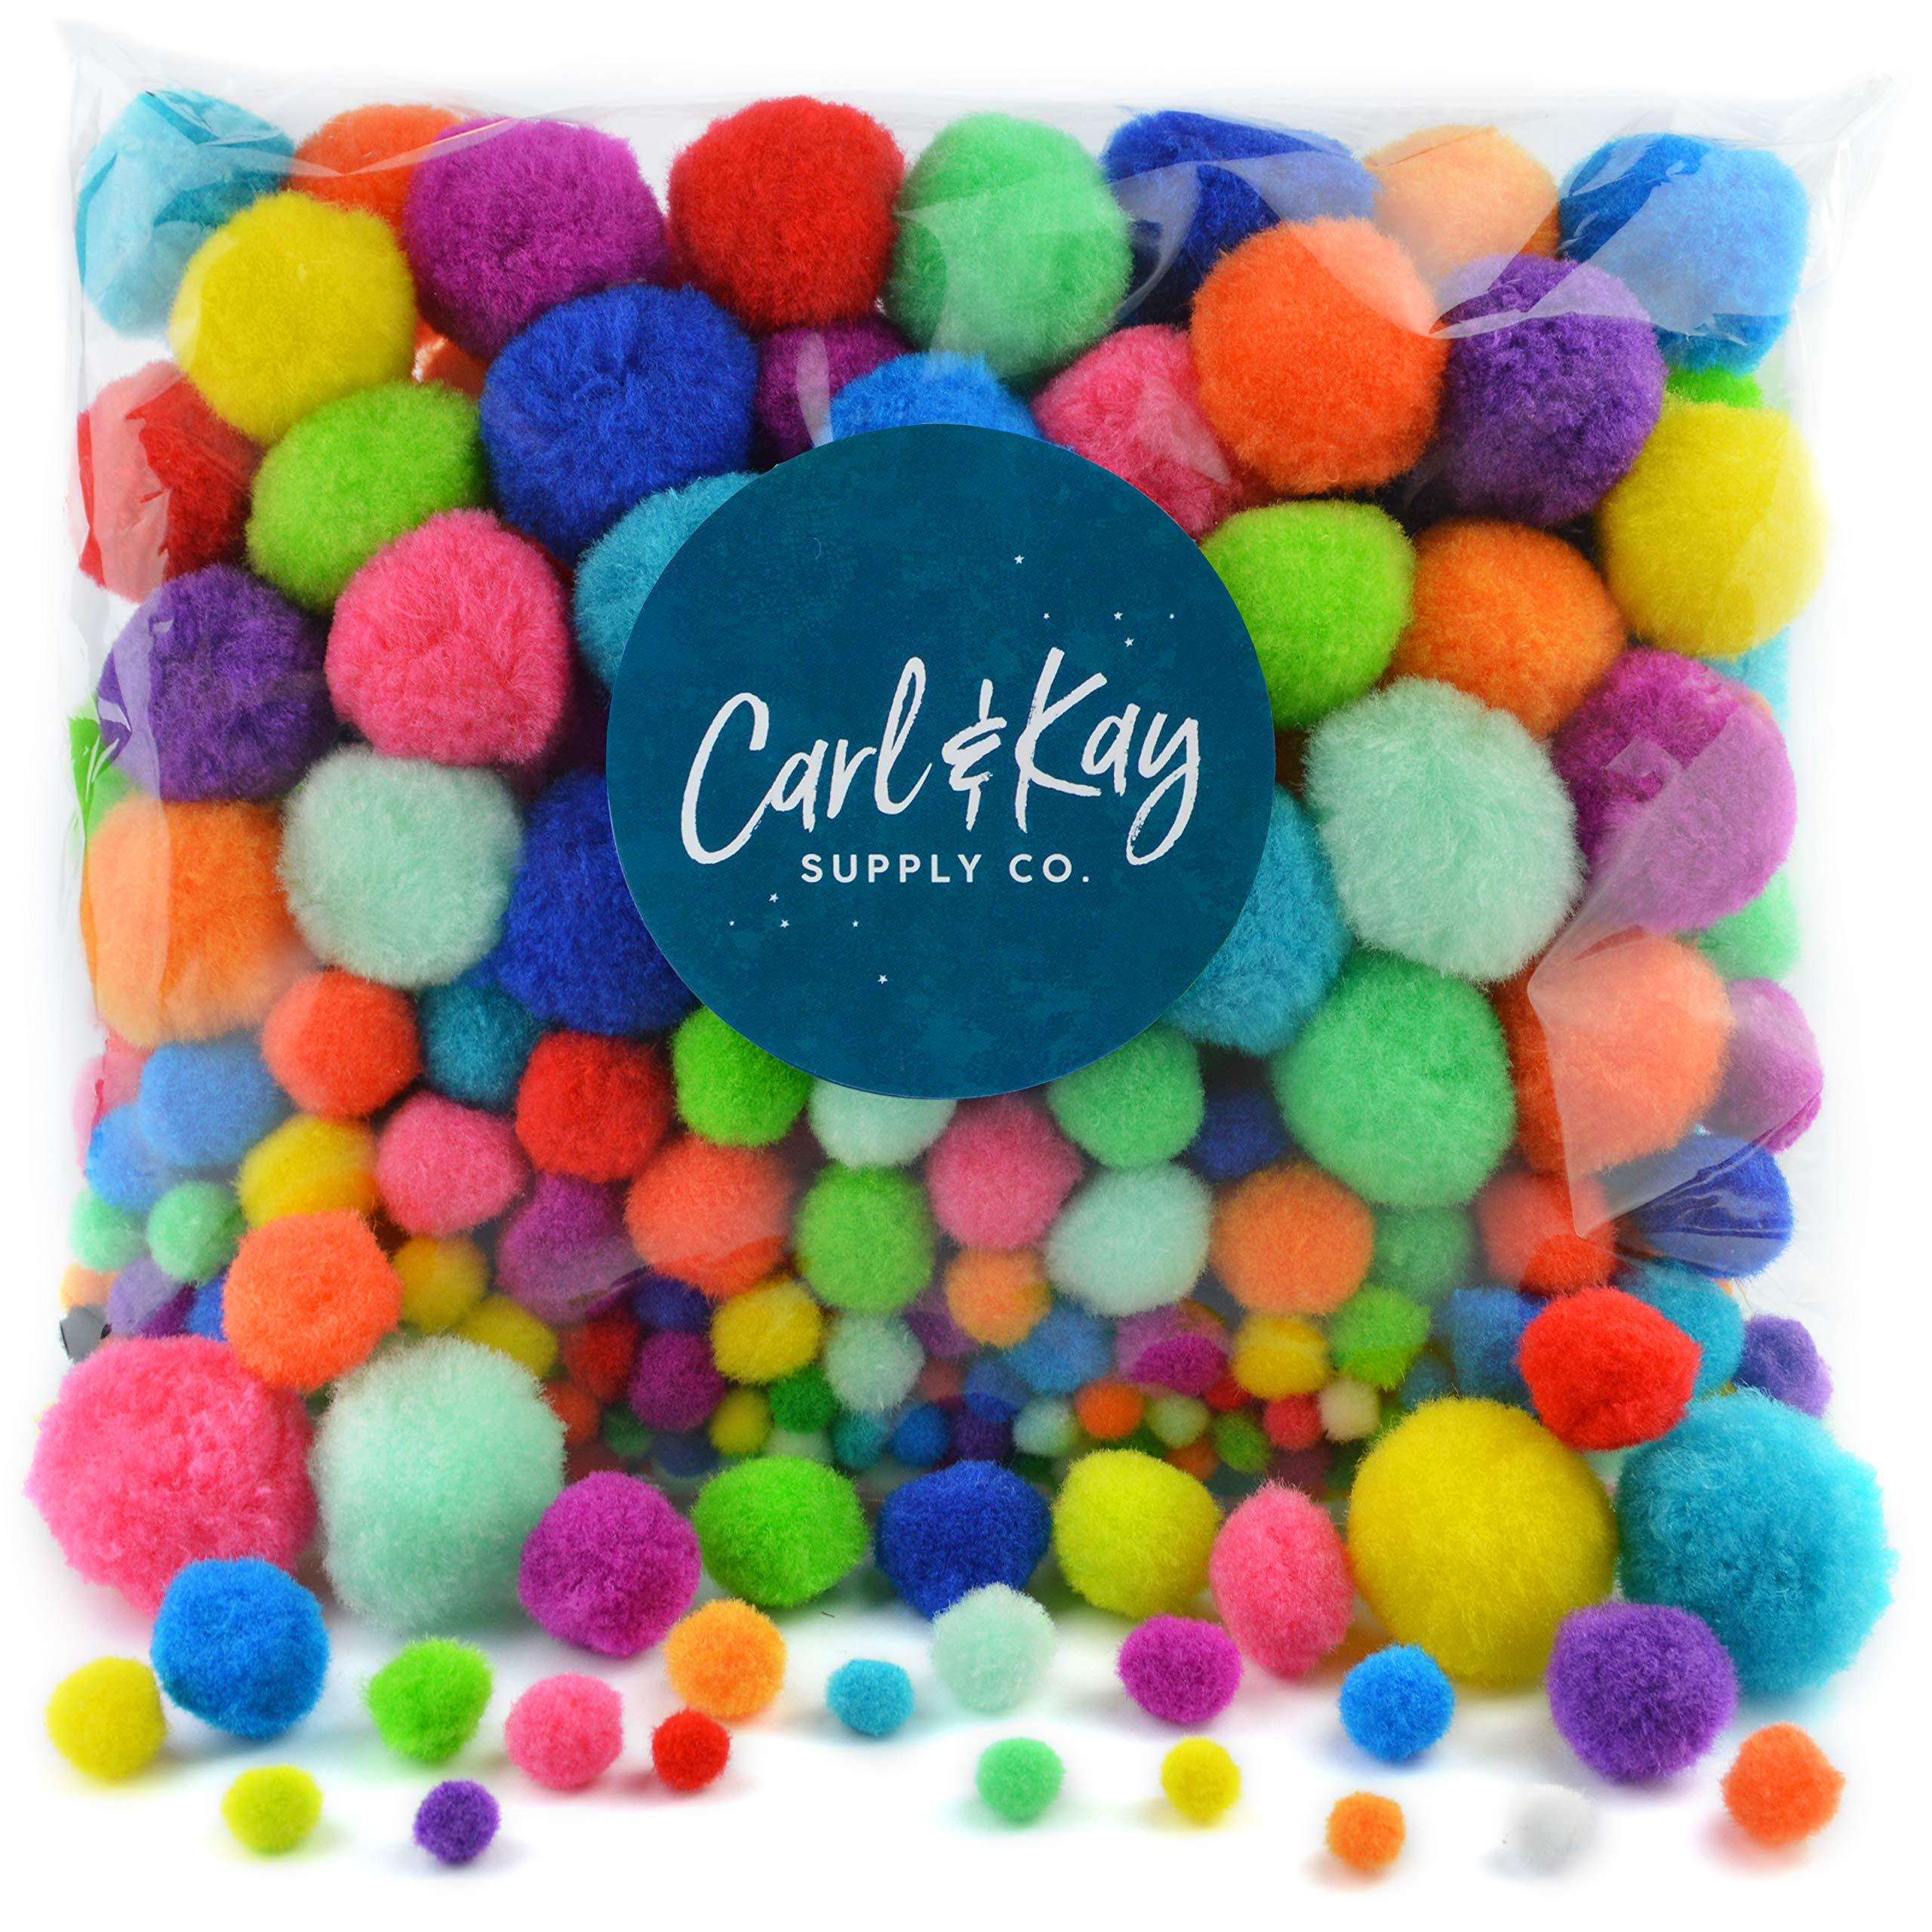 Carl & Kay [360 pcs] Assorted Size Pom Poms for Crafts, Creative Kid's Gift, Multi Colored Big Pompoms, Jumbo & Large Craft Pom Pom Balls